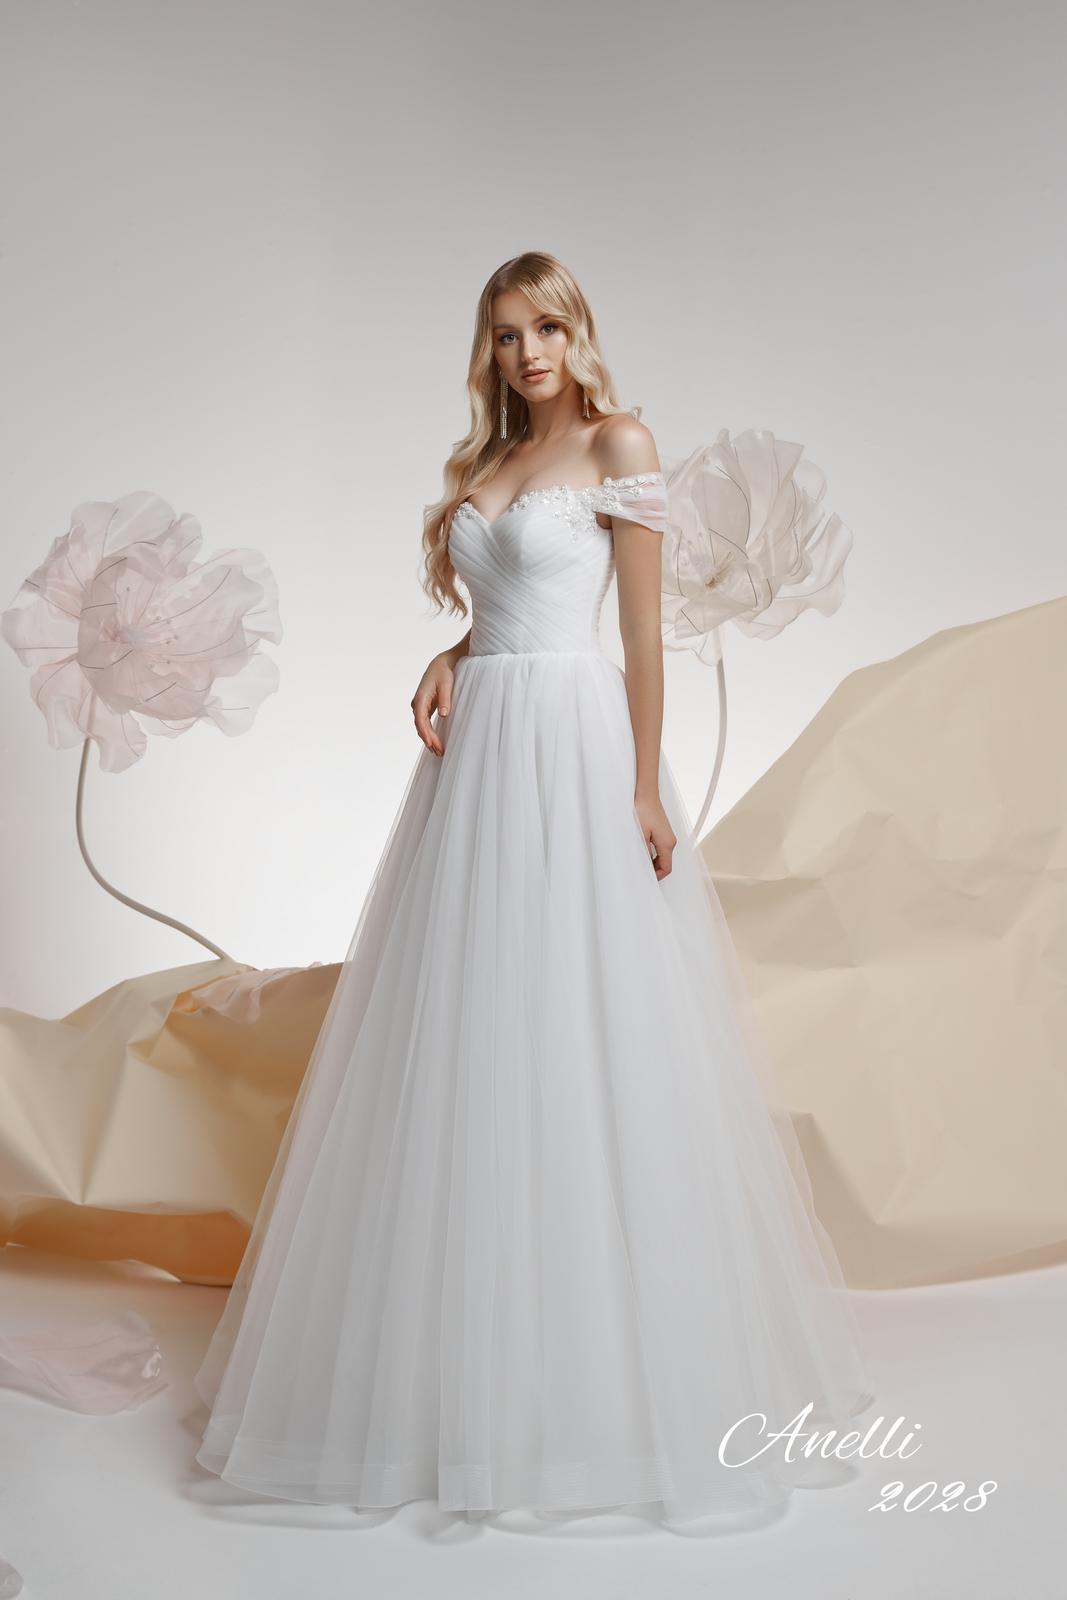 Svadobné šaty - Imagine 2028 - Obrázok č. 1